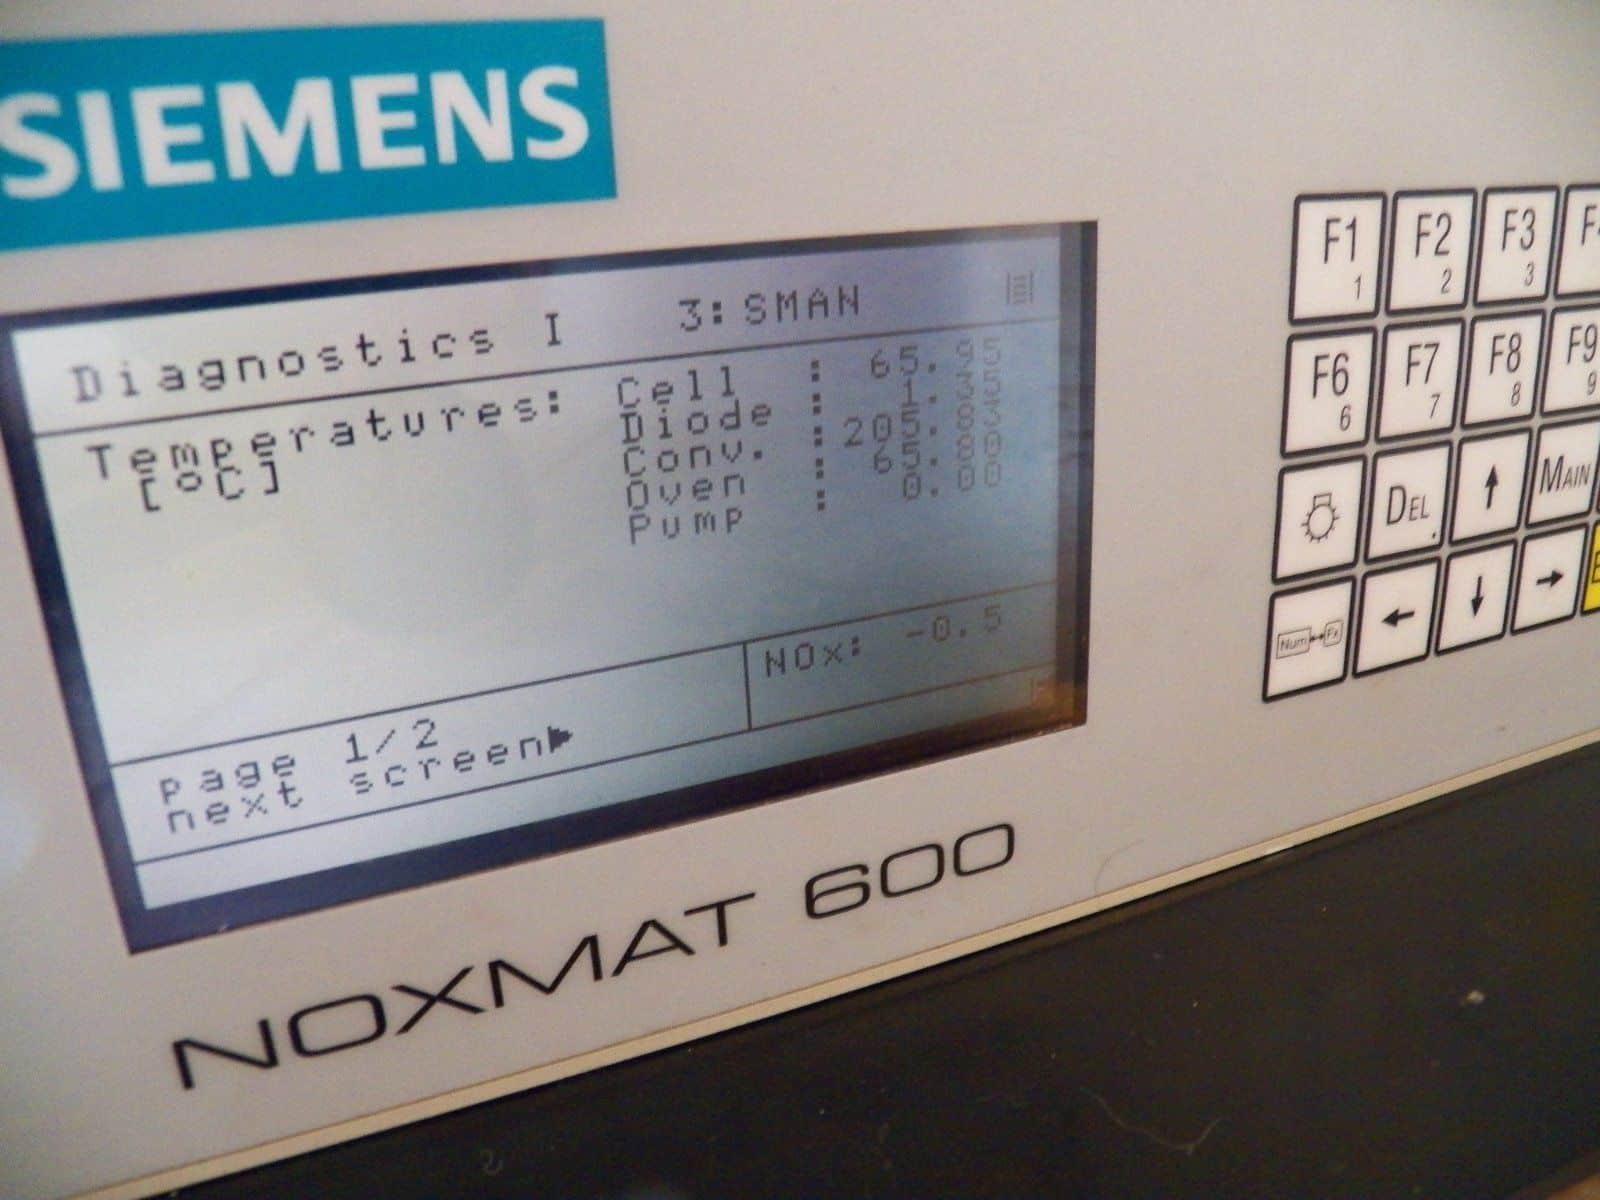 Siemens NOXMAT 600 NO NOx Gas Analyzer.  0-1 ppm up to 0 -3000 ppm